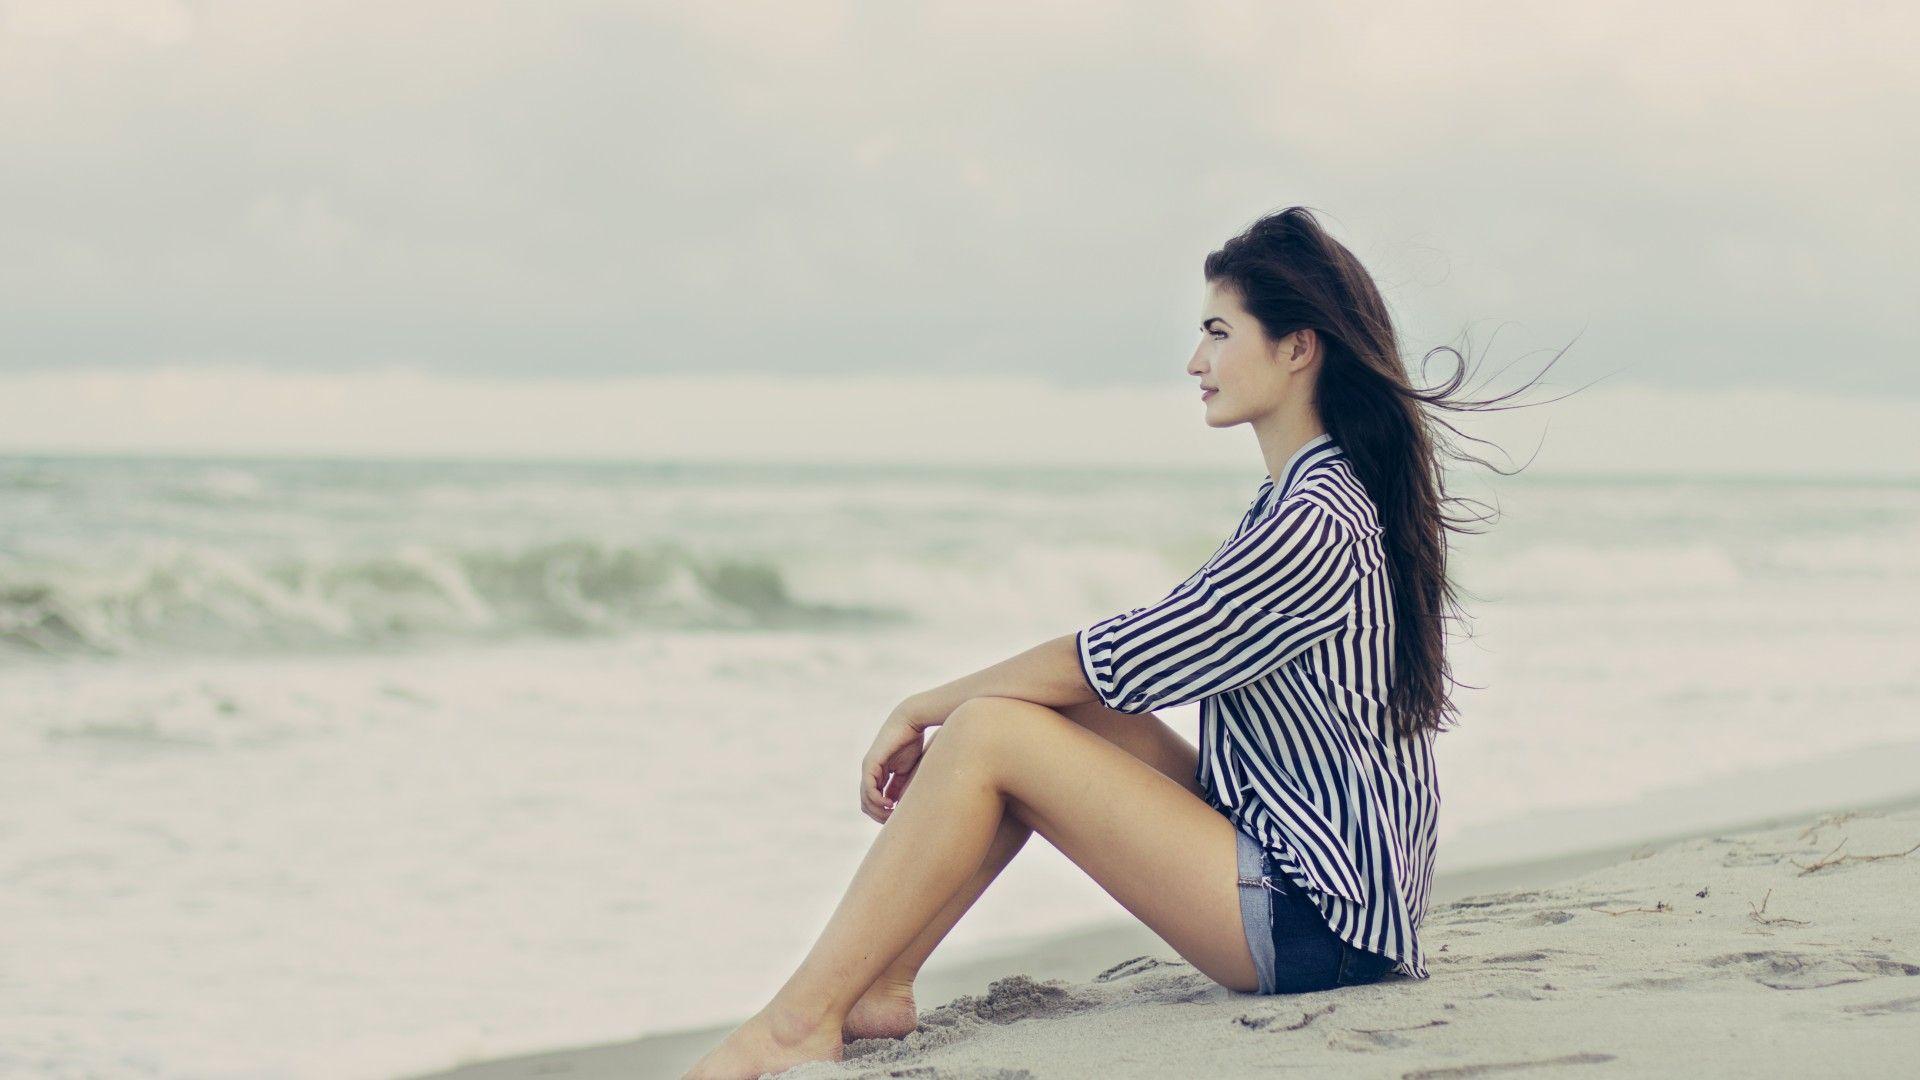 фото девушки на пляже брюнетки